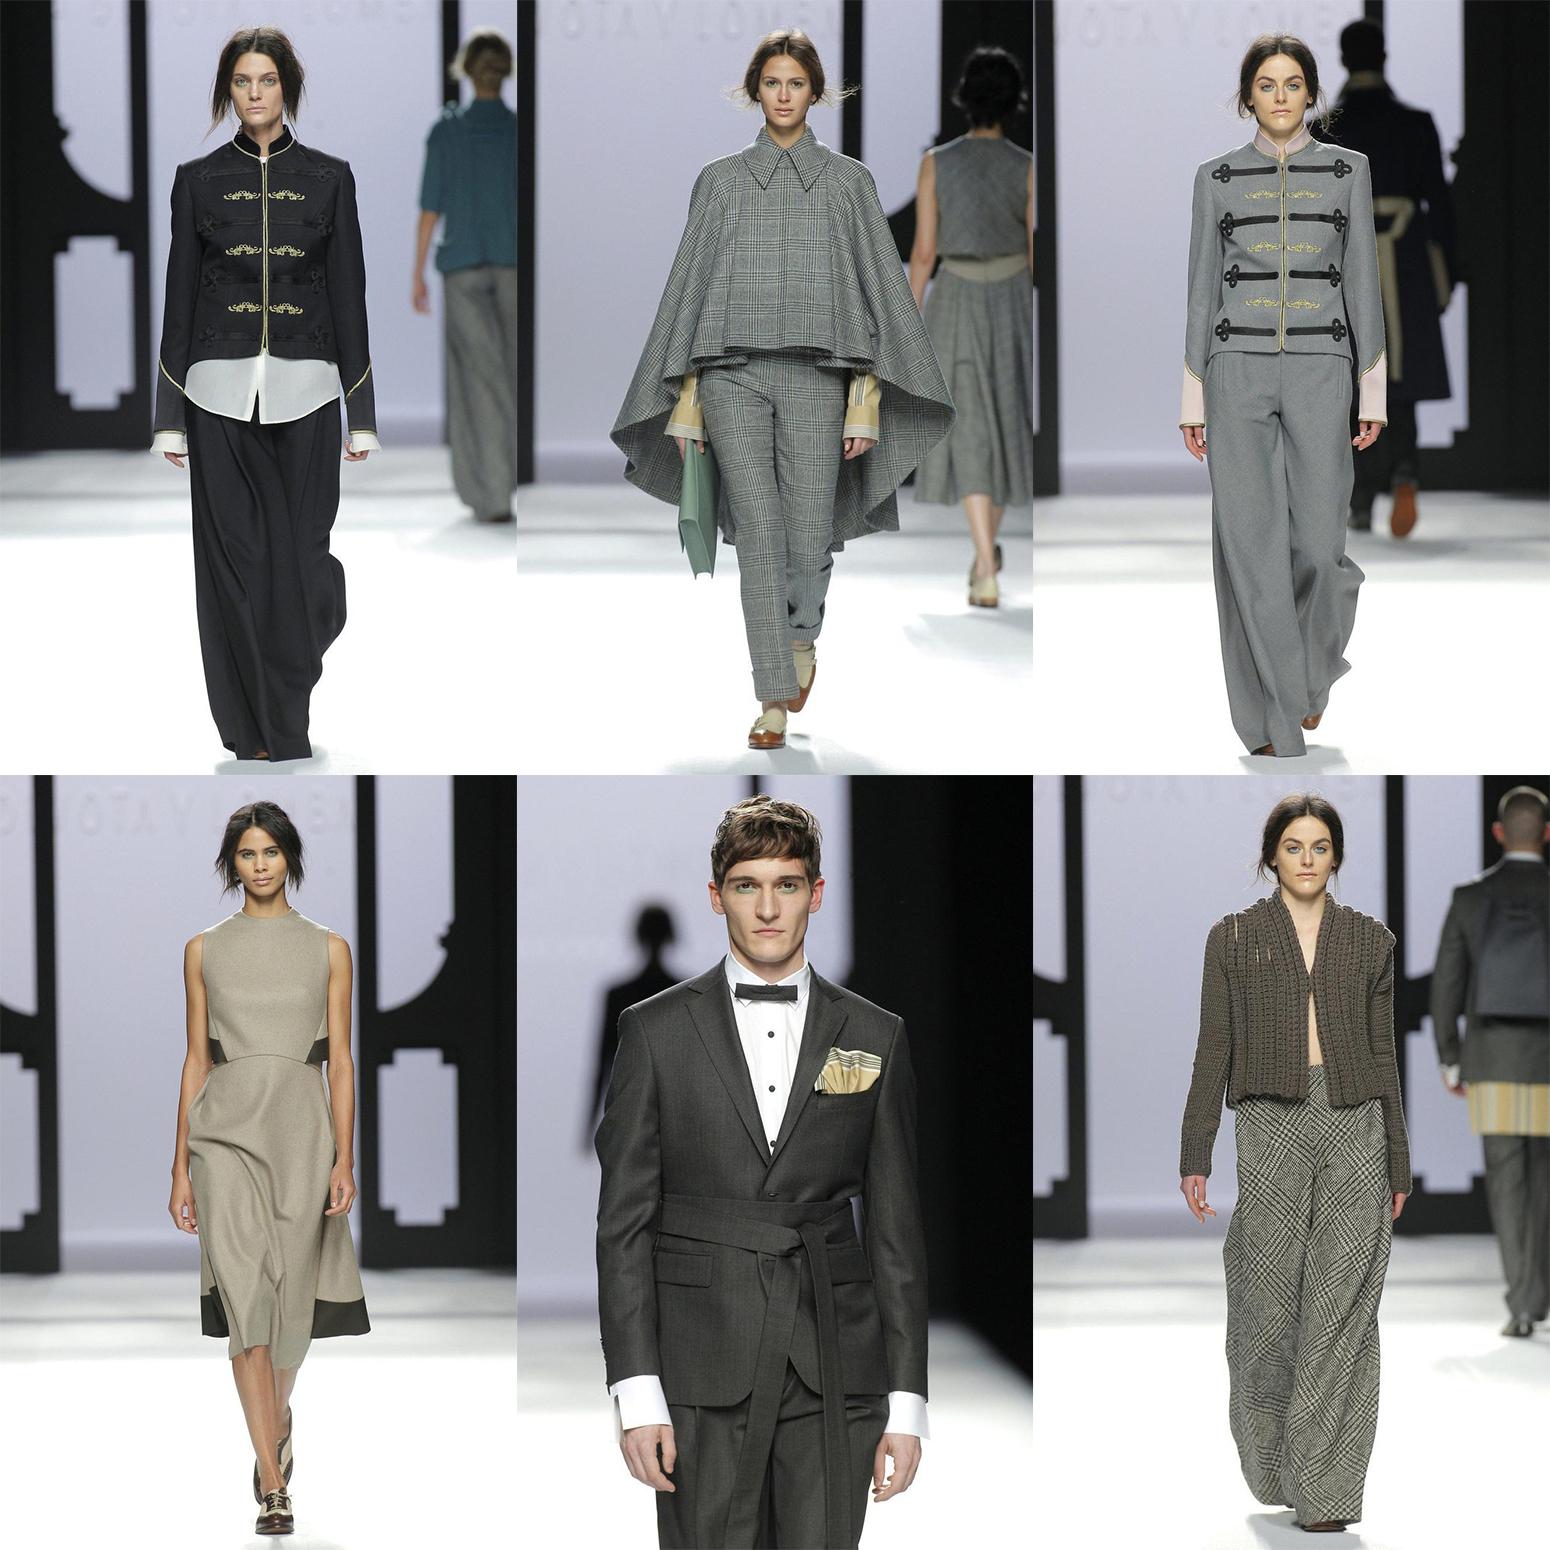 Tulle black skirt blazer maje madrid fashion week fashion outfit1